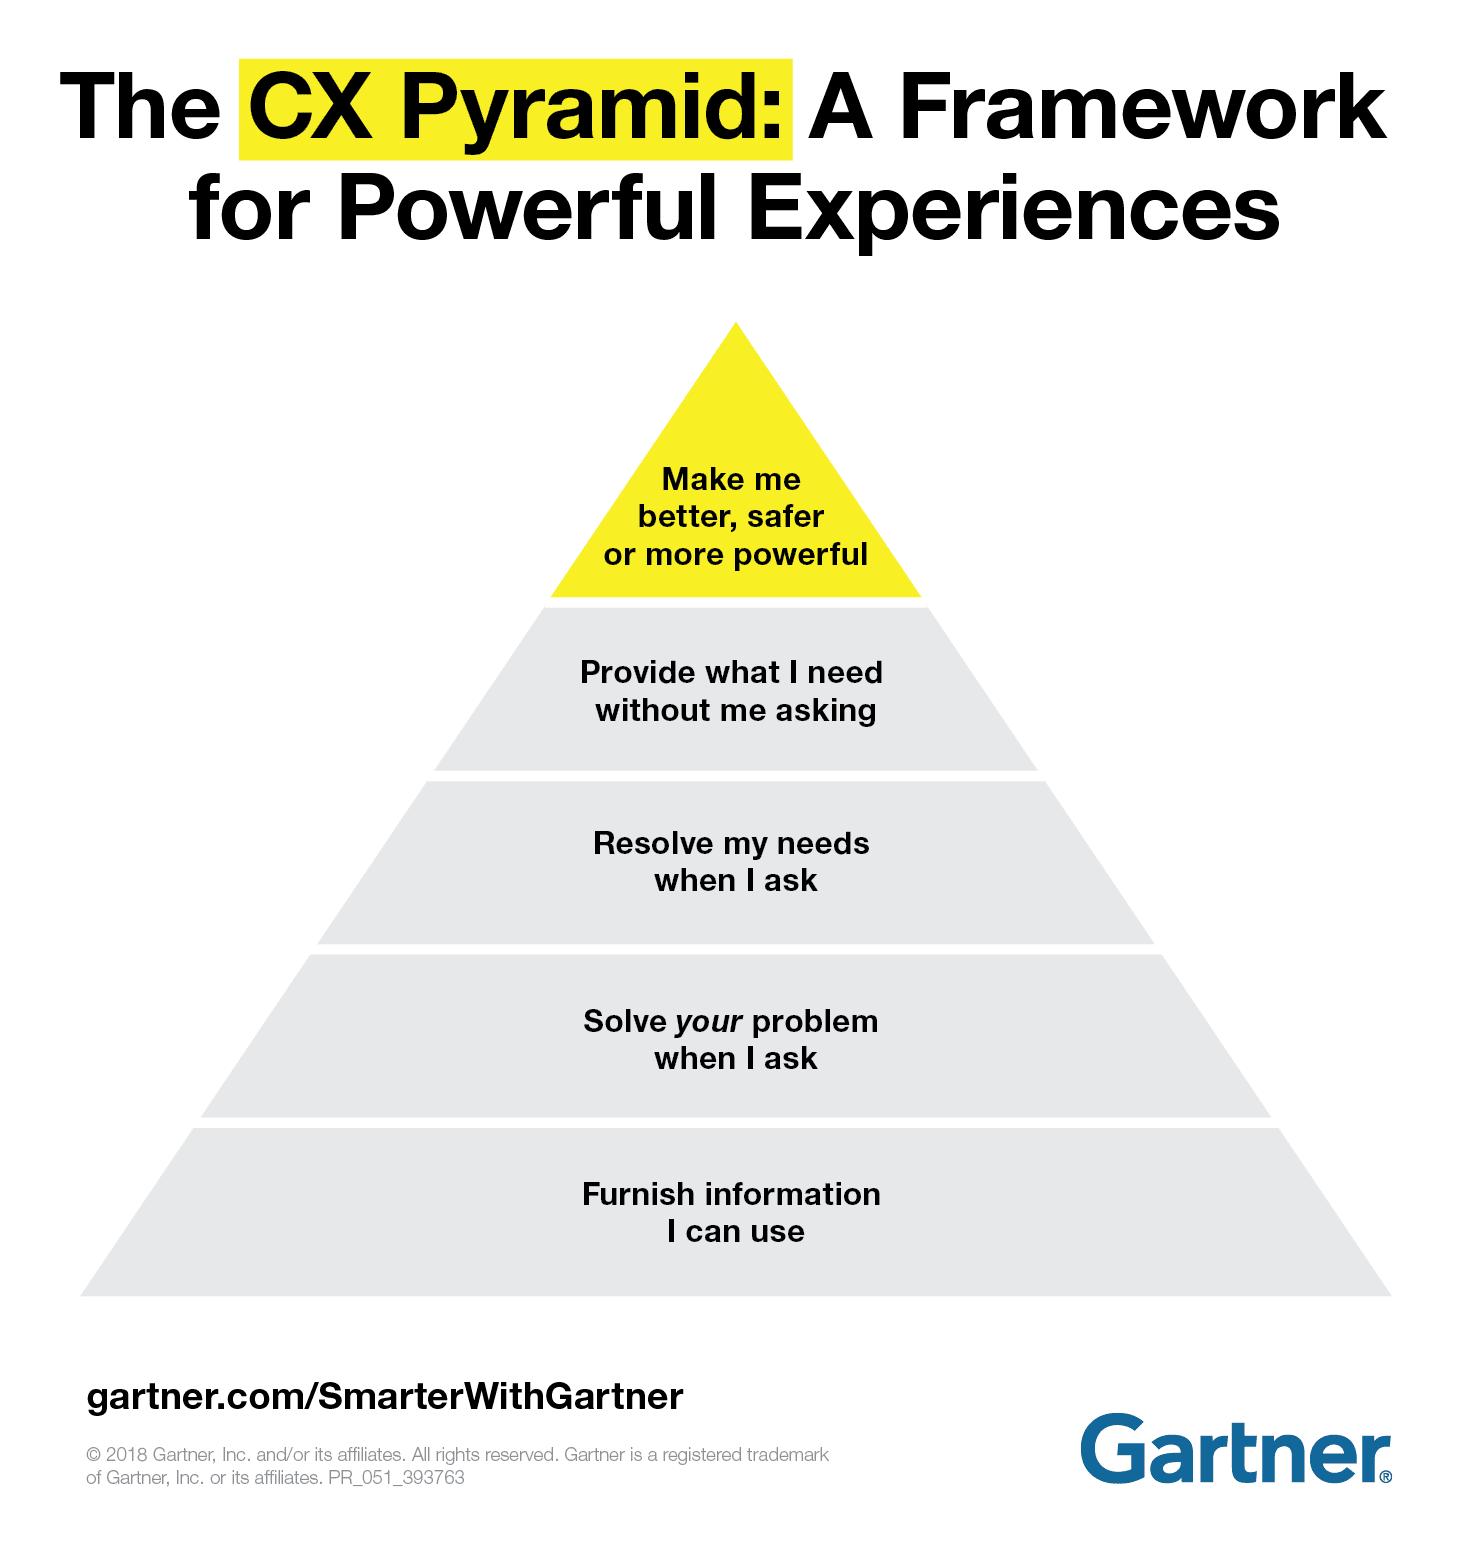 Gartner CX Pyramid